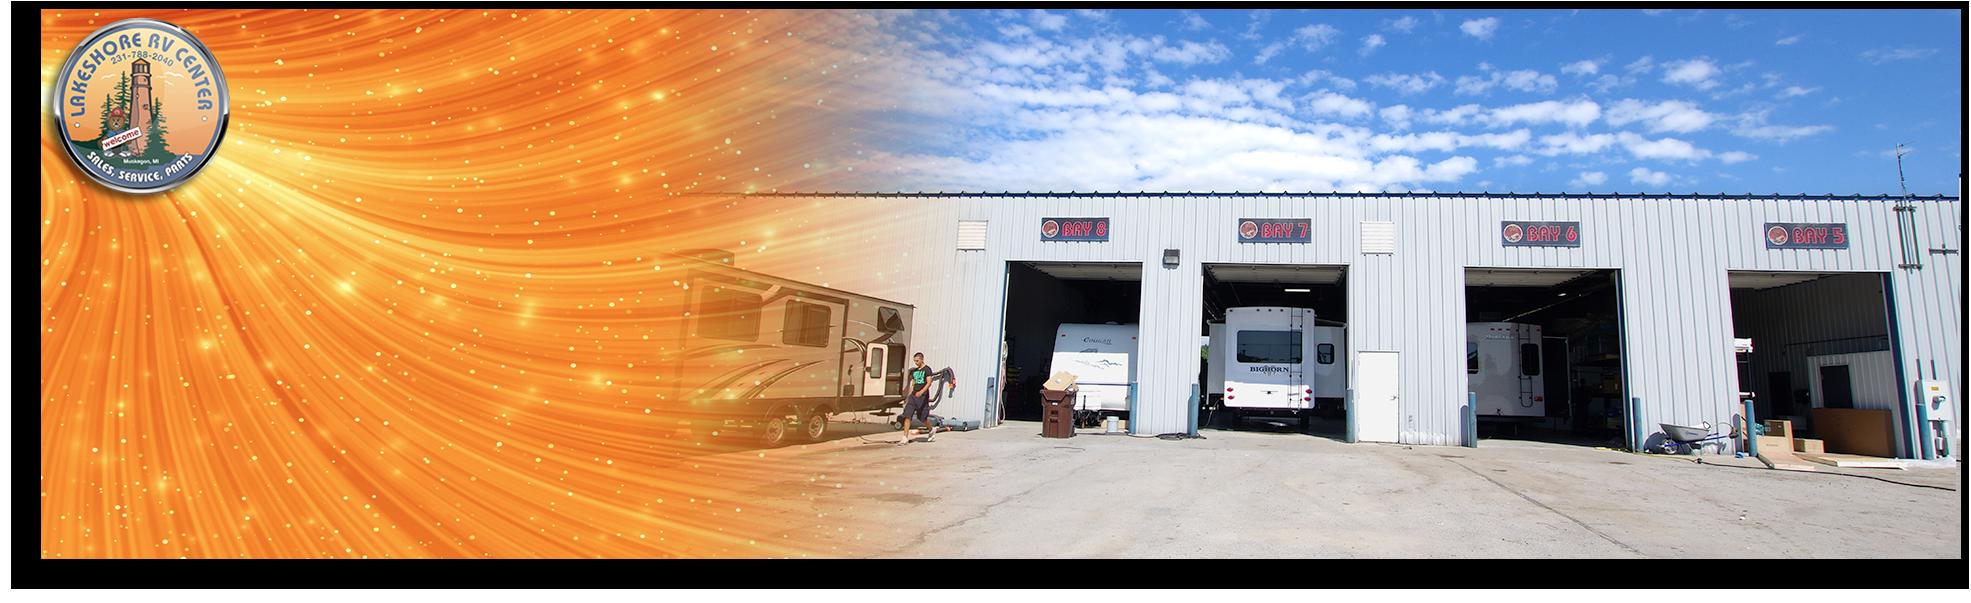 Lakeshore RV Service Department- Expert Service & Repair